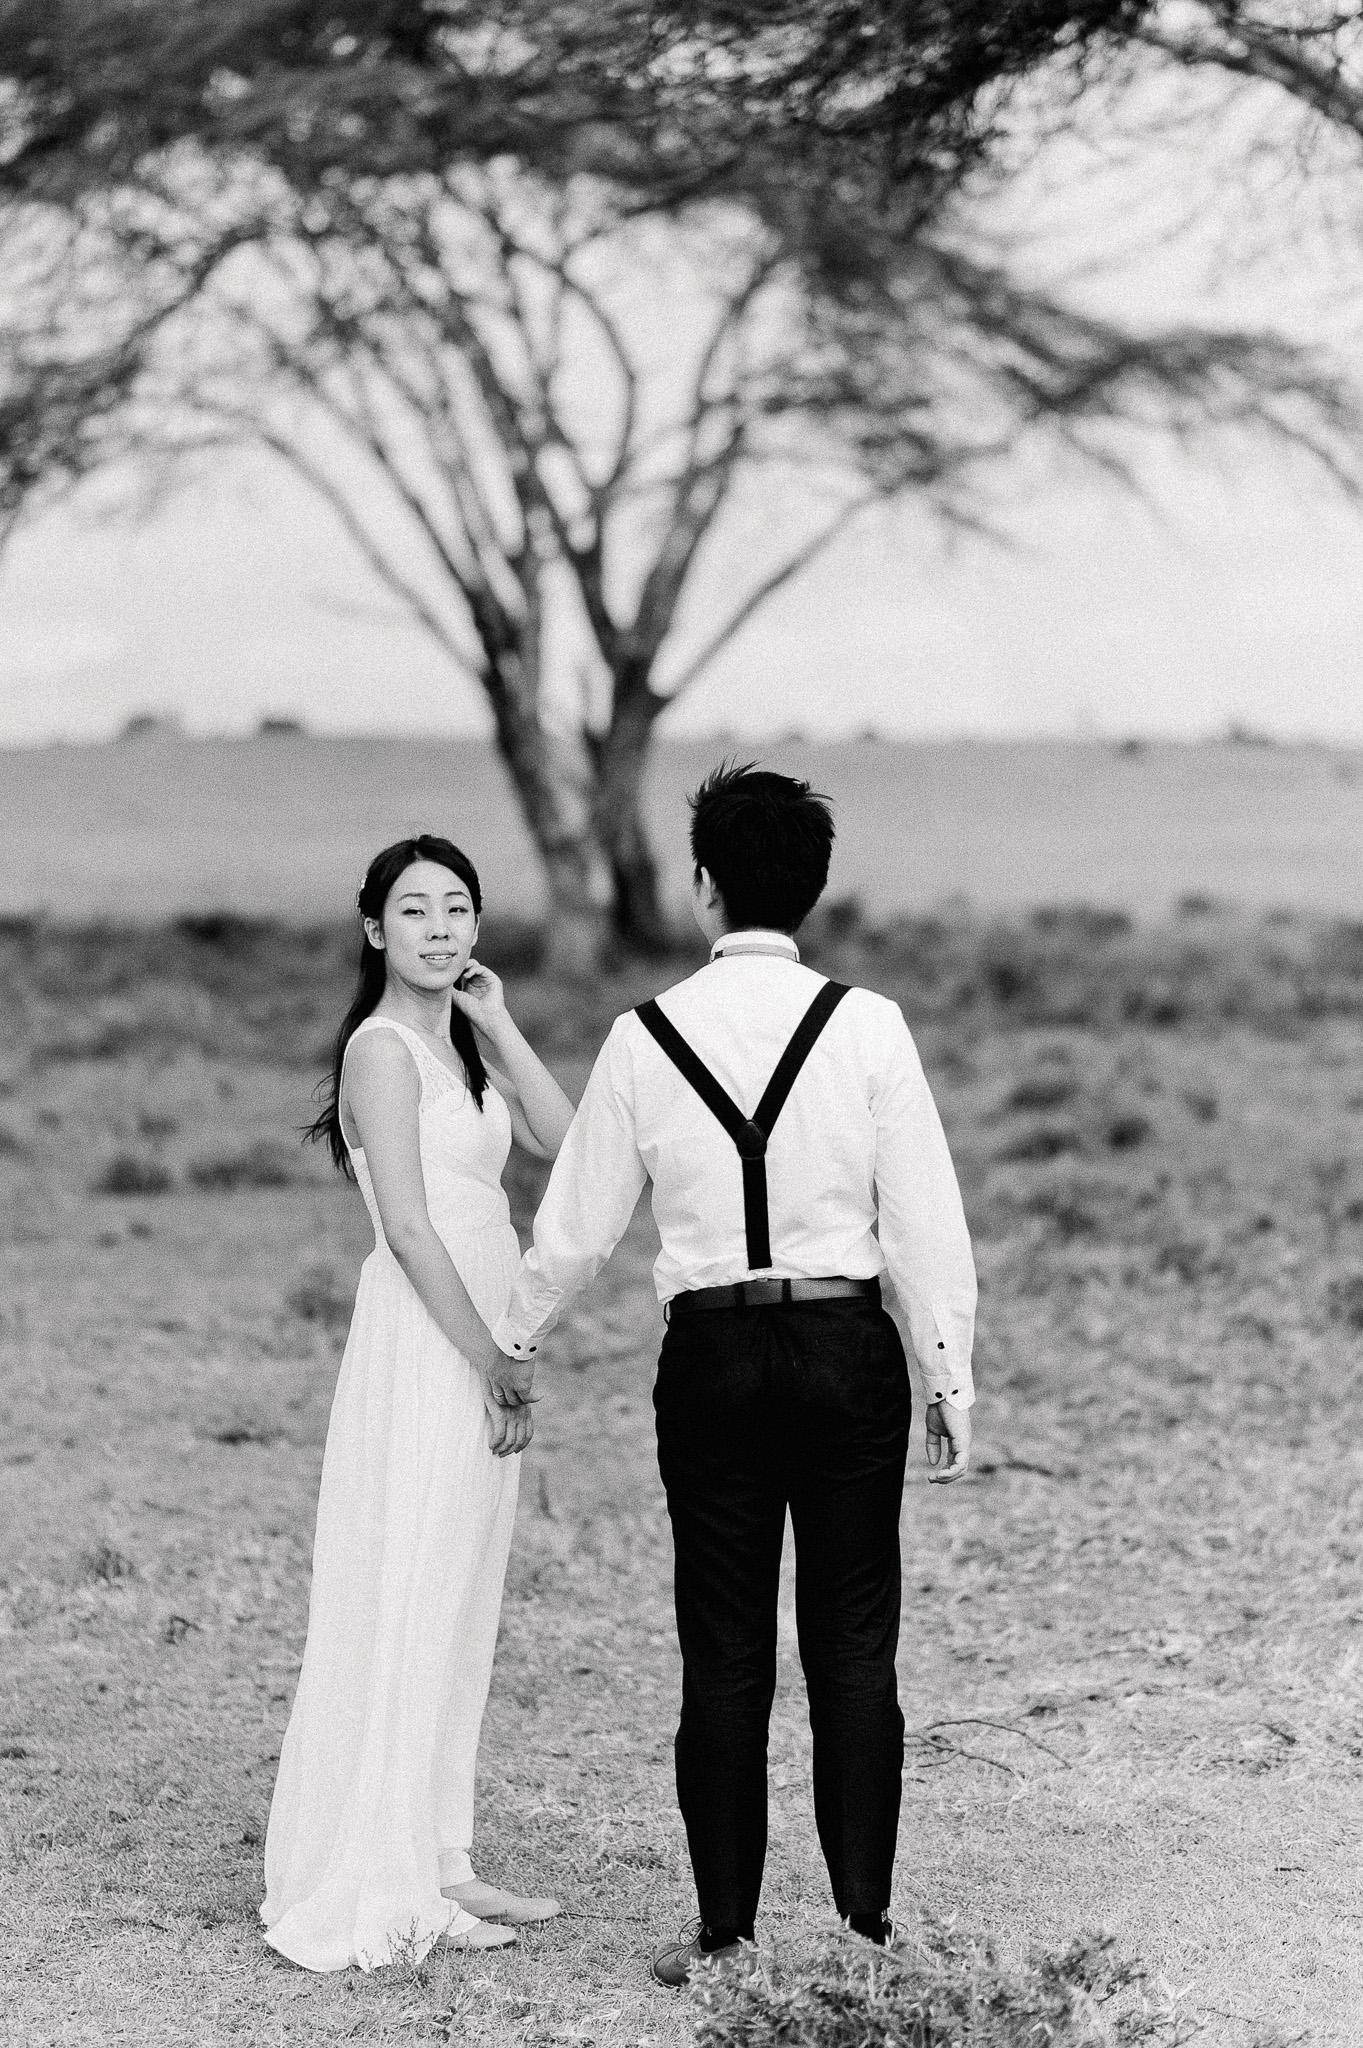 Anna-Hari-Photography-Safari-Elopement-Kenya-Wedding-Photographer-Kenya-32.jpg